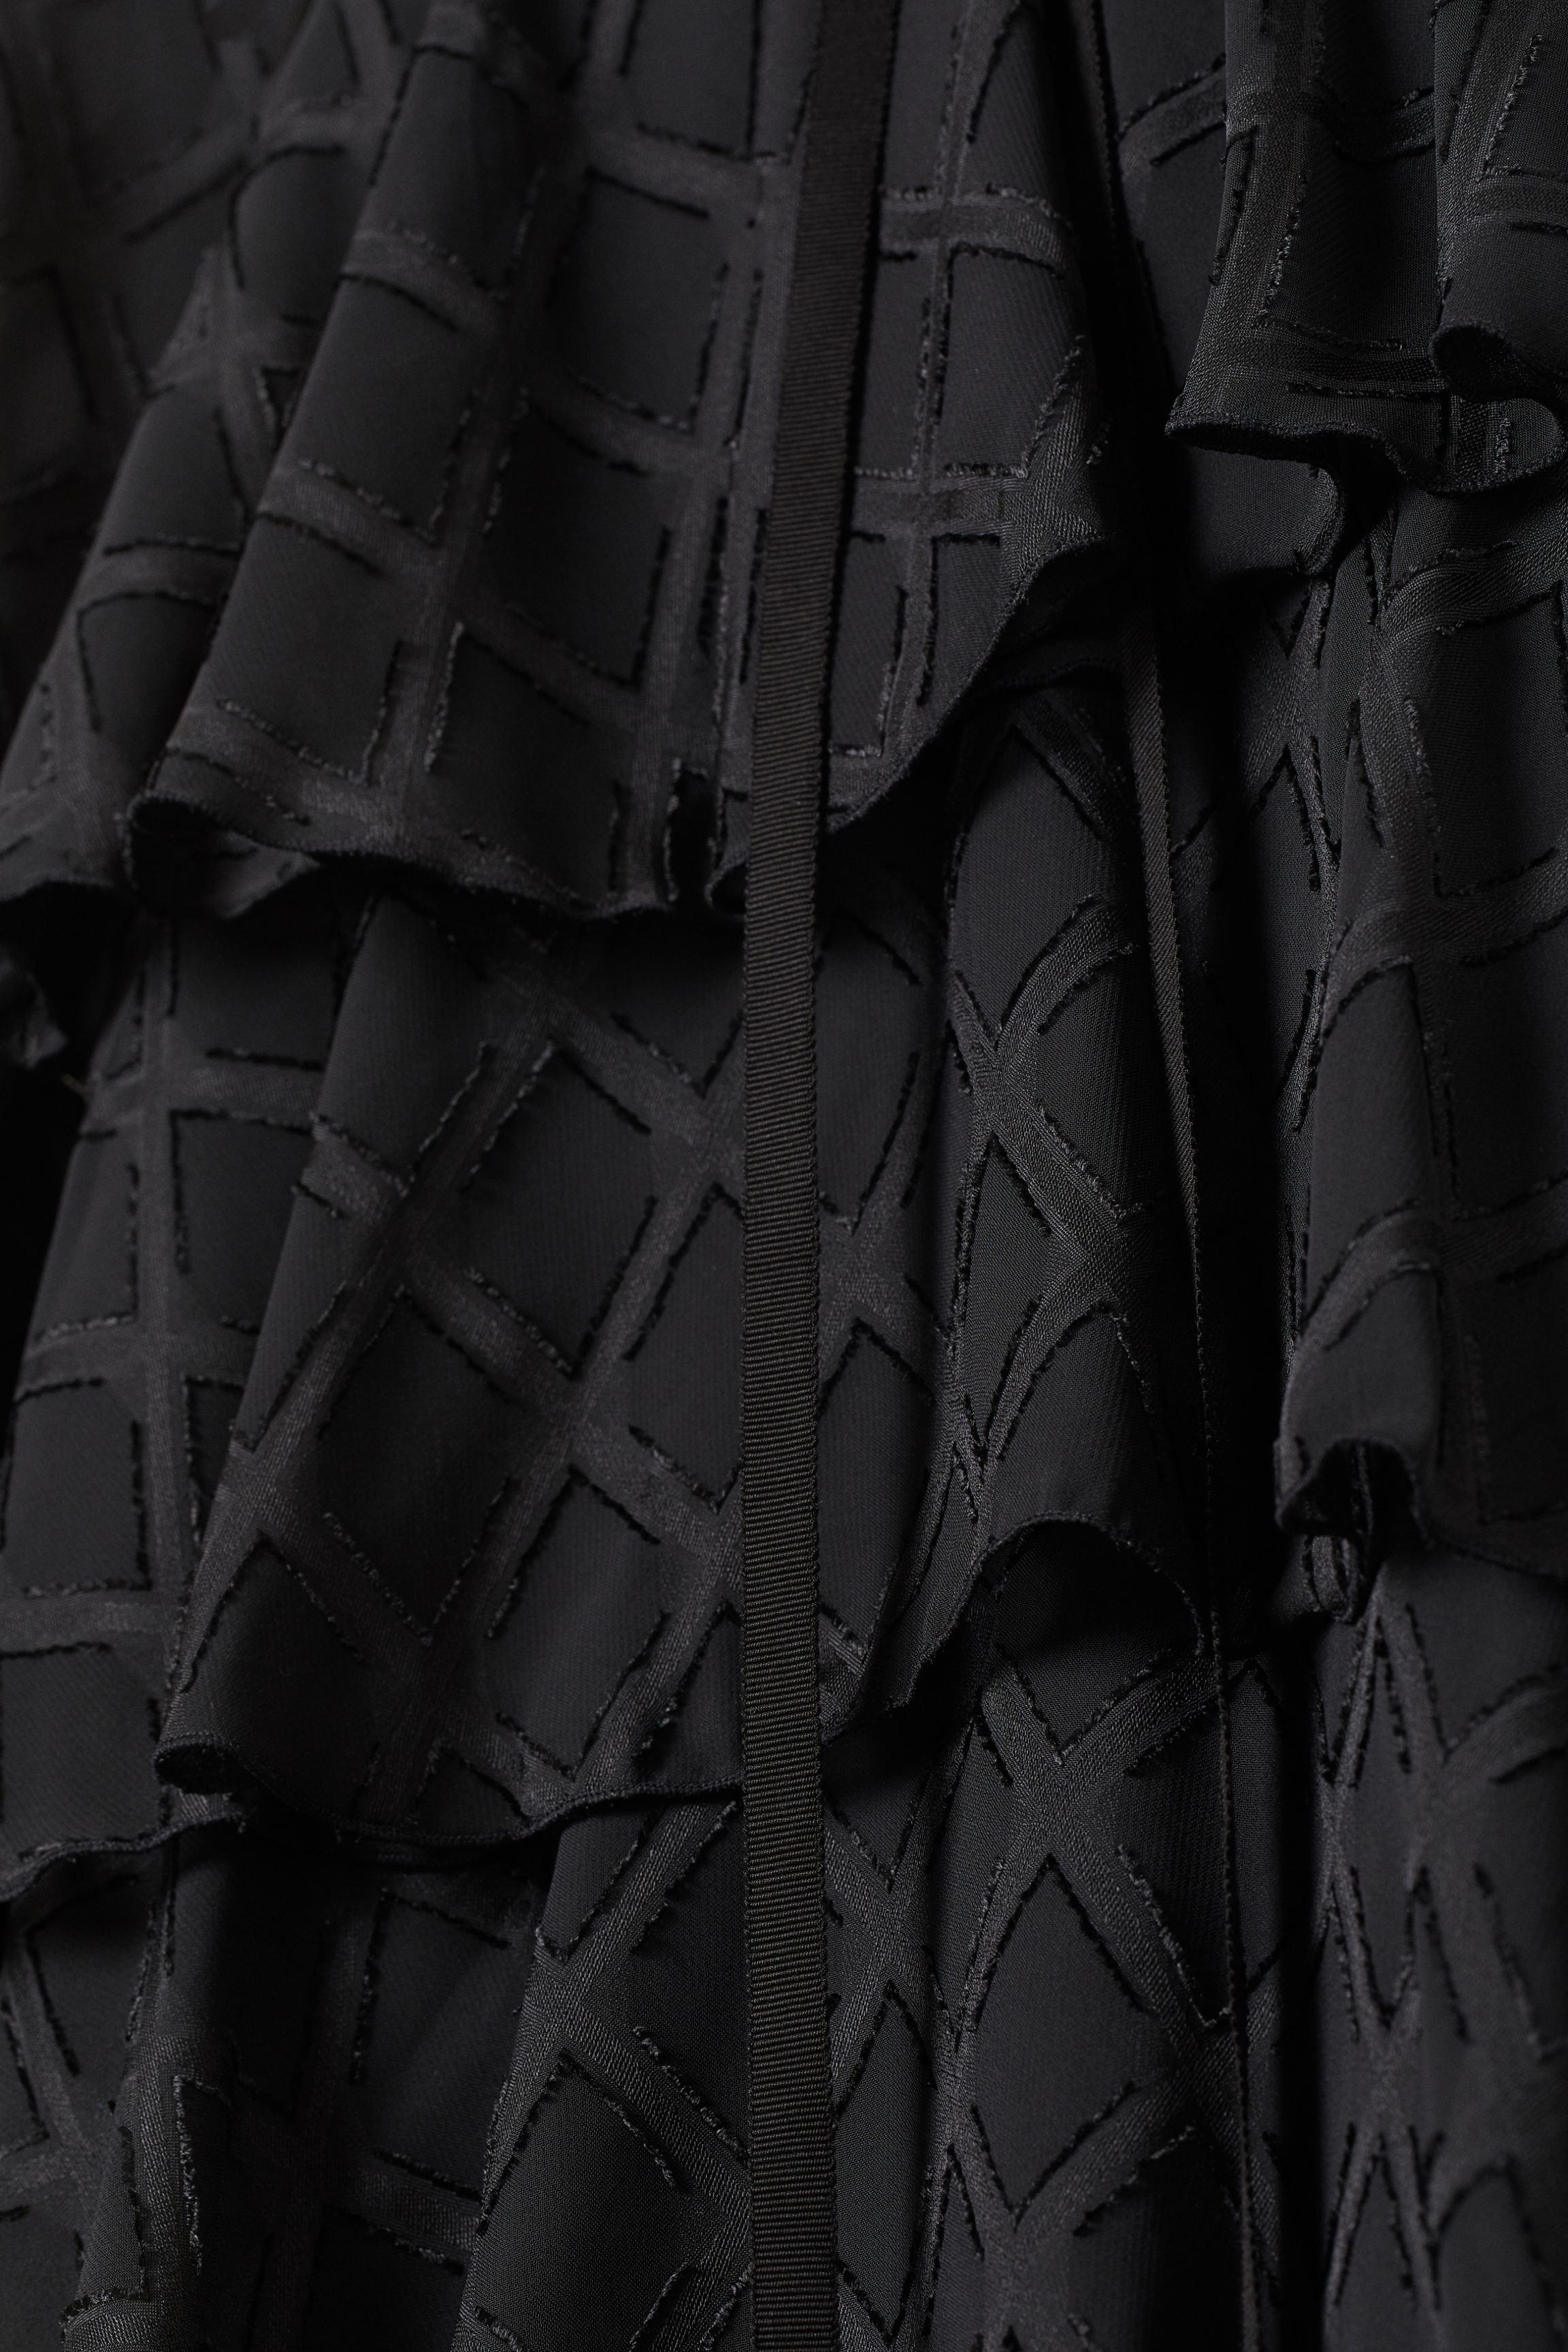 Jacquard-patterned Dress